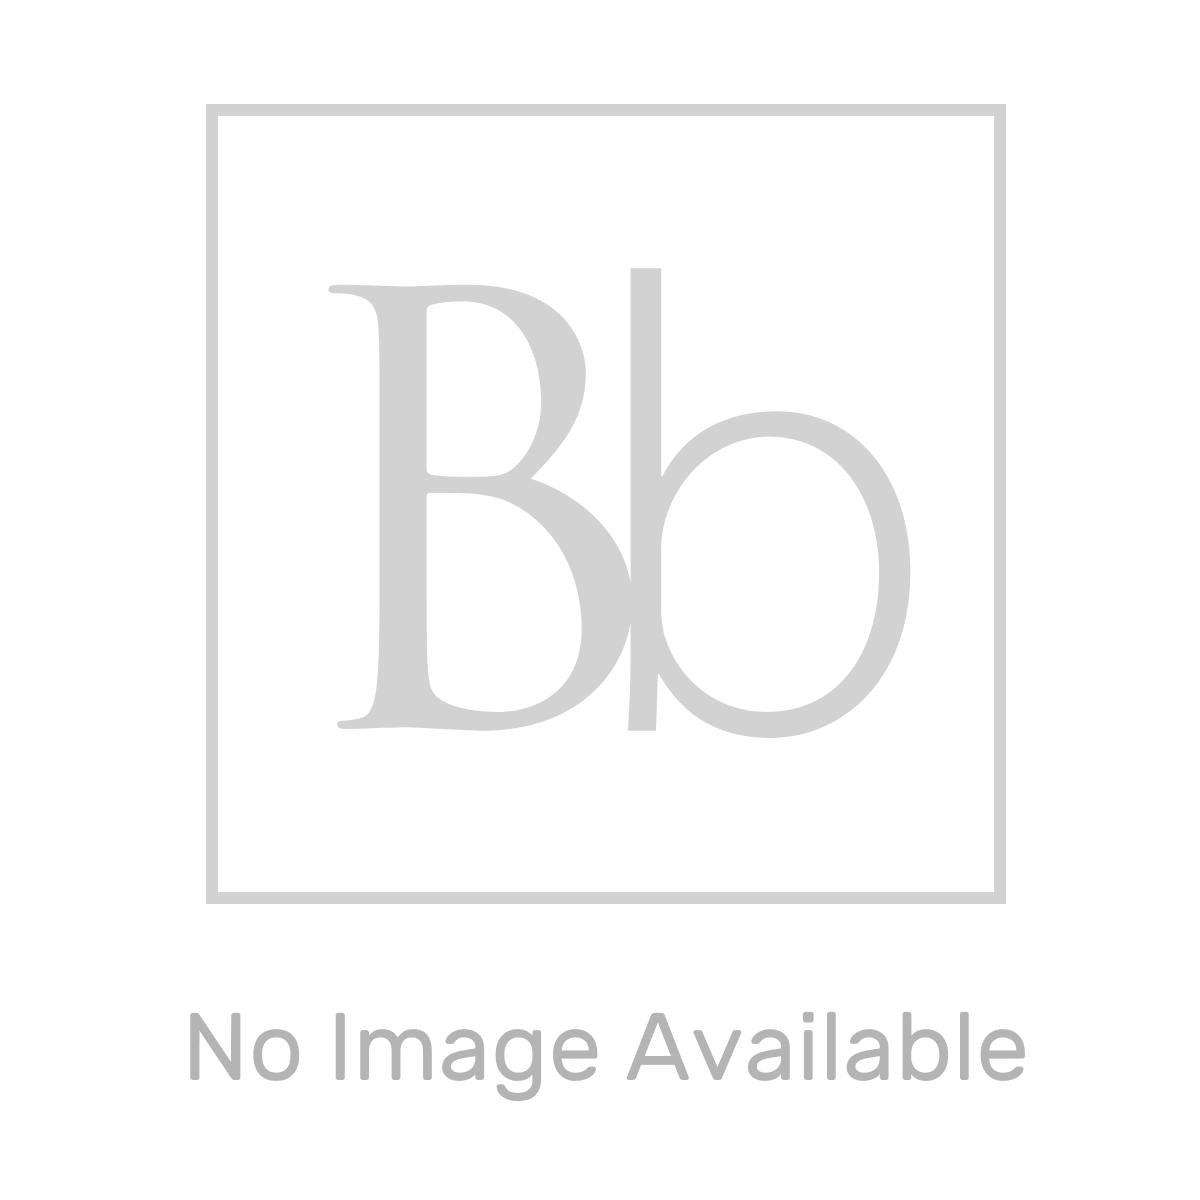 RAK Resort Bathroom Suite with Pacific Walk-In Shower Enclosure